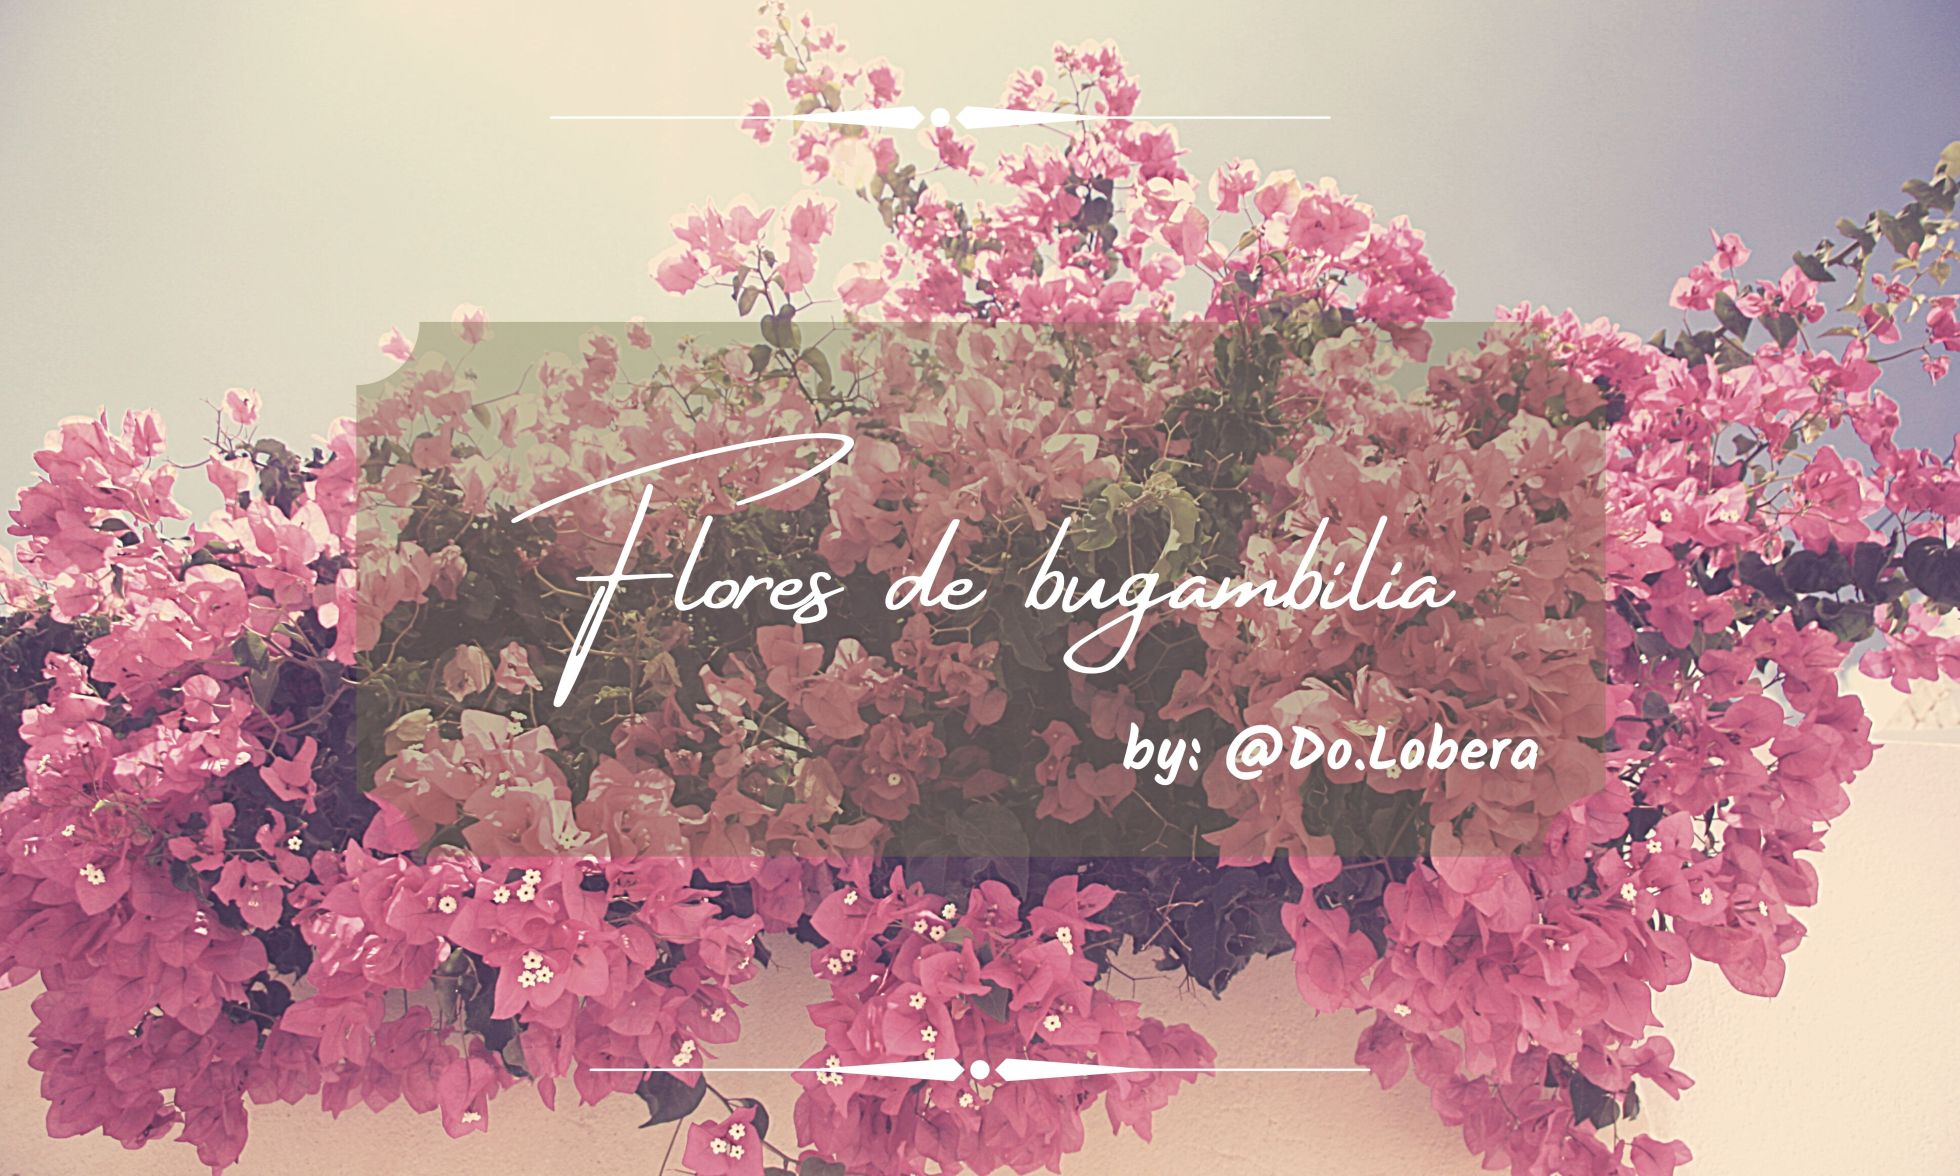 Flores de bugambilia - by Do.Lobera